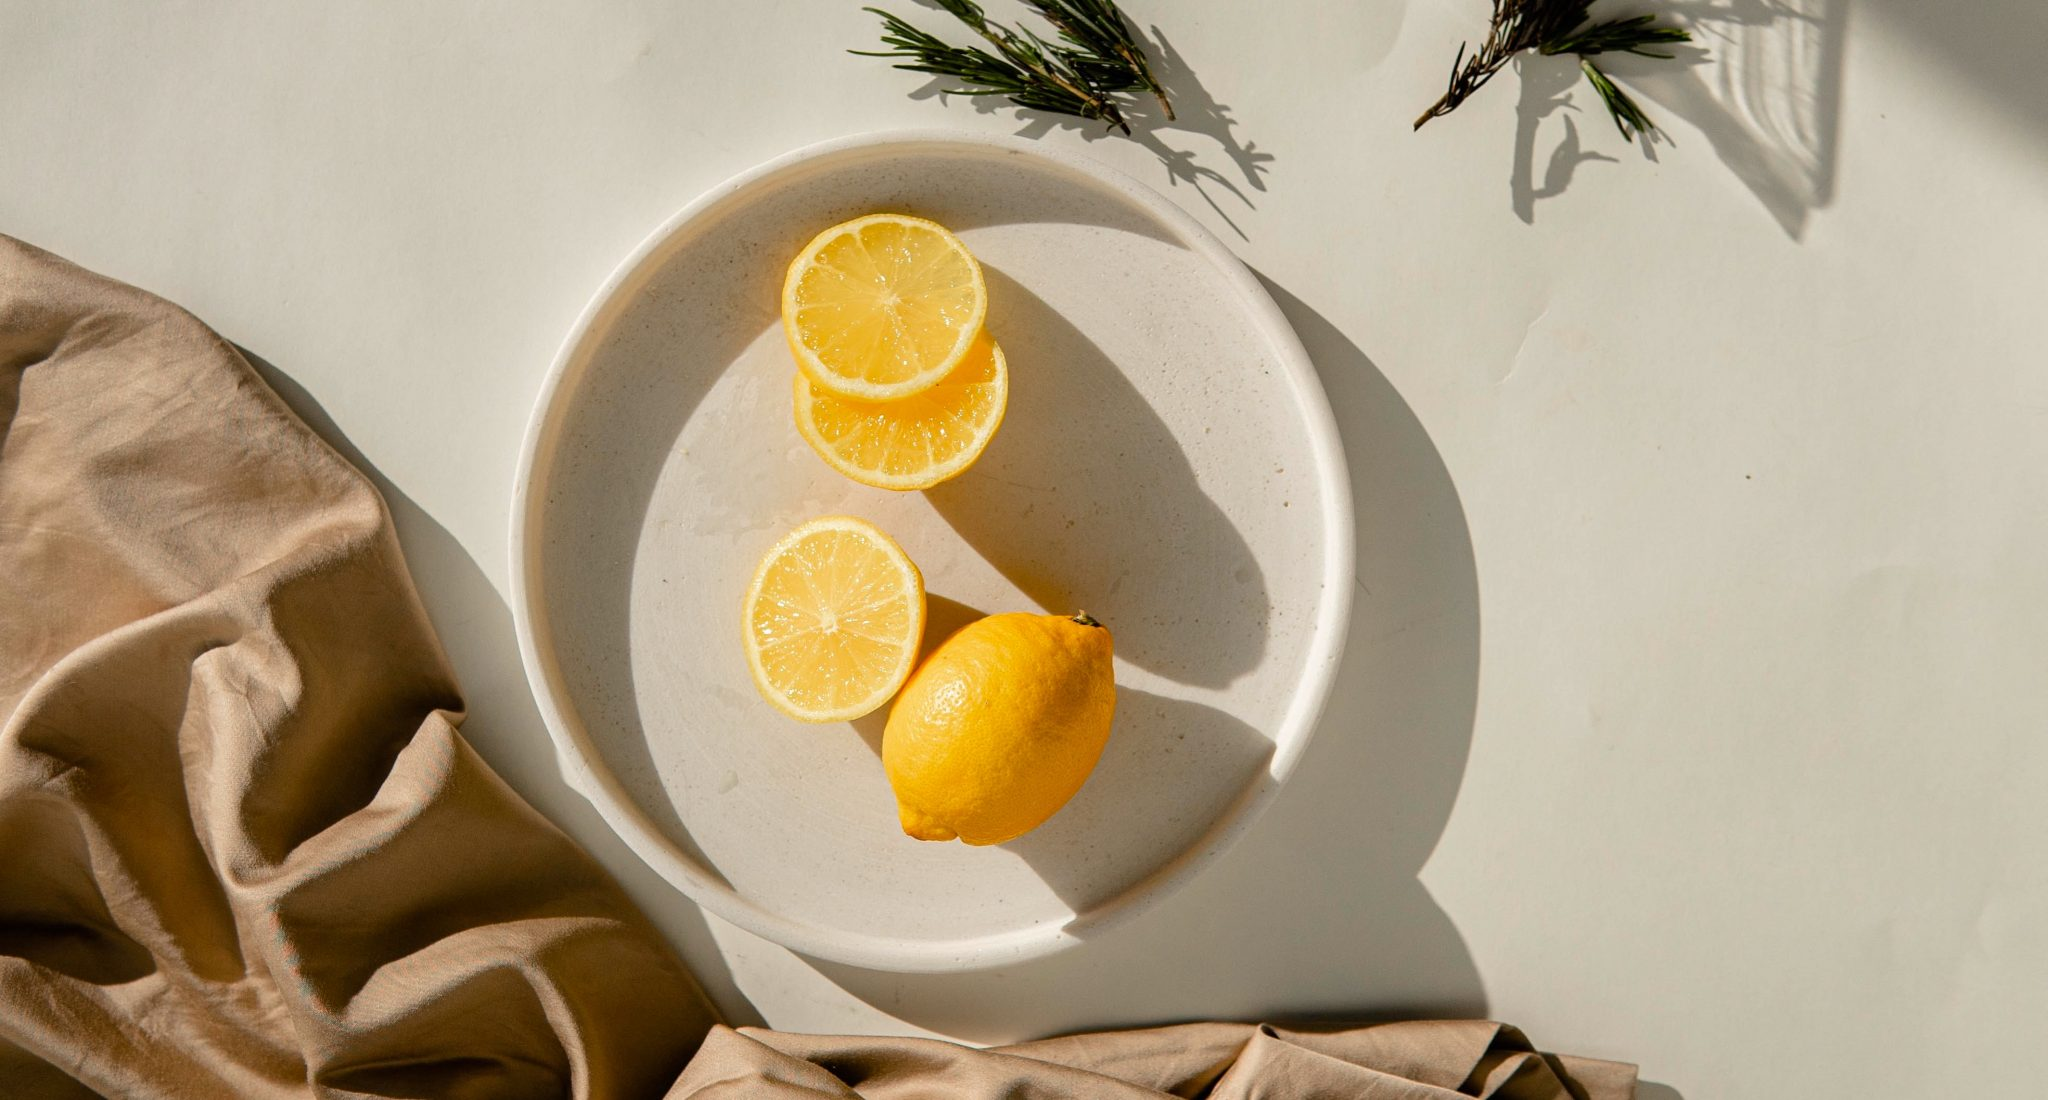 O τρόπος να διατηρήσεις φρέσκα τα λεμόνια σου